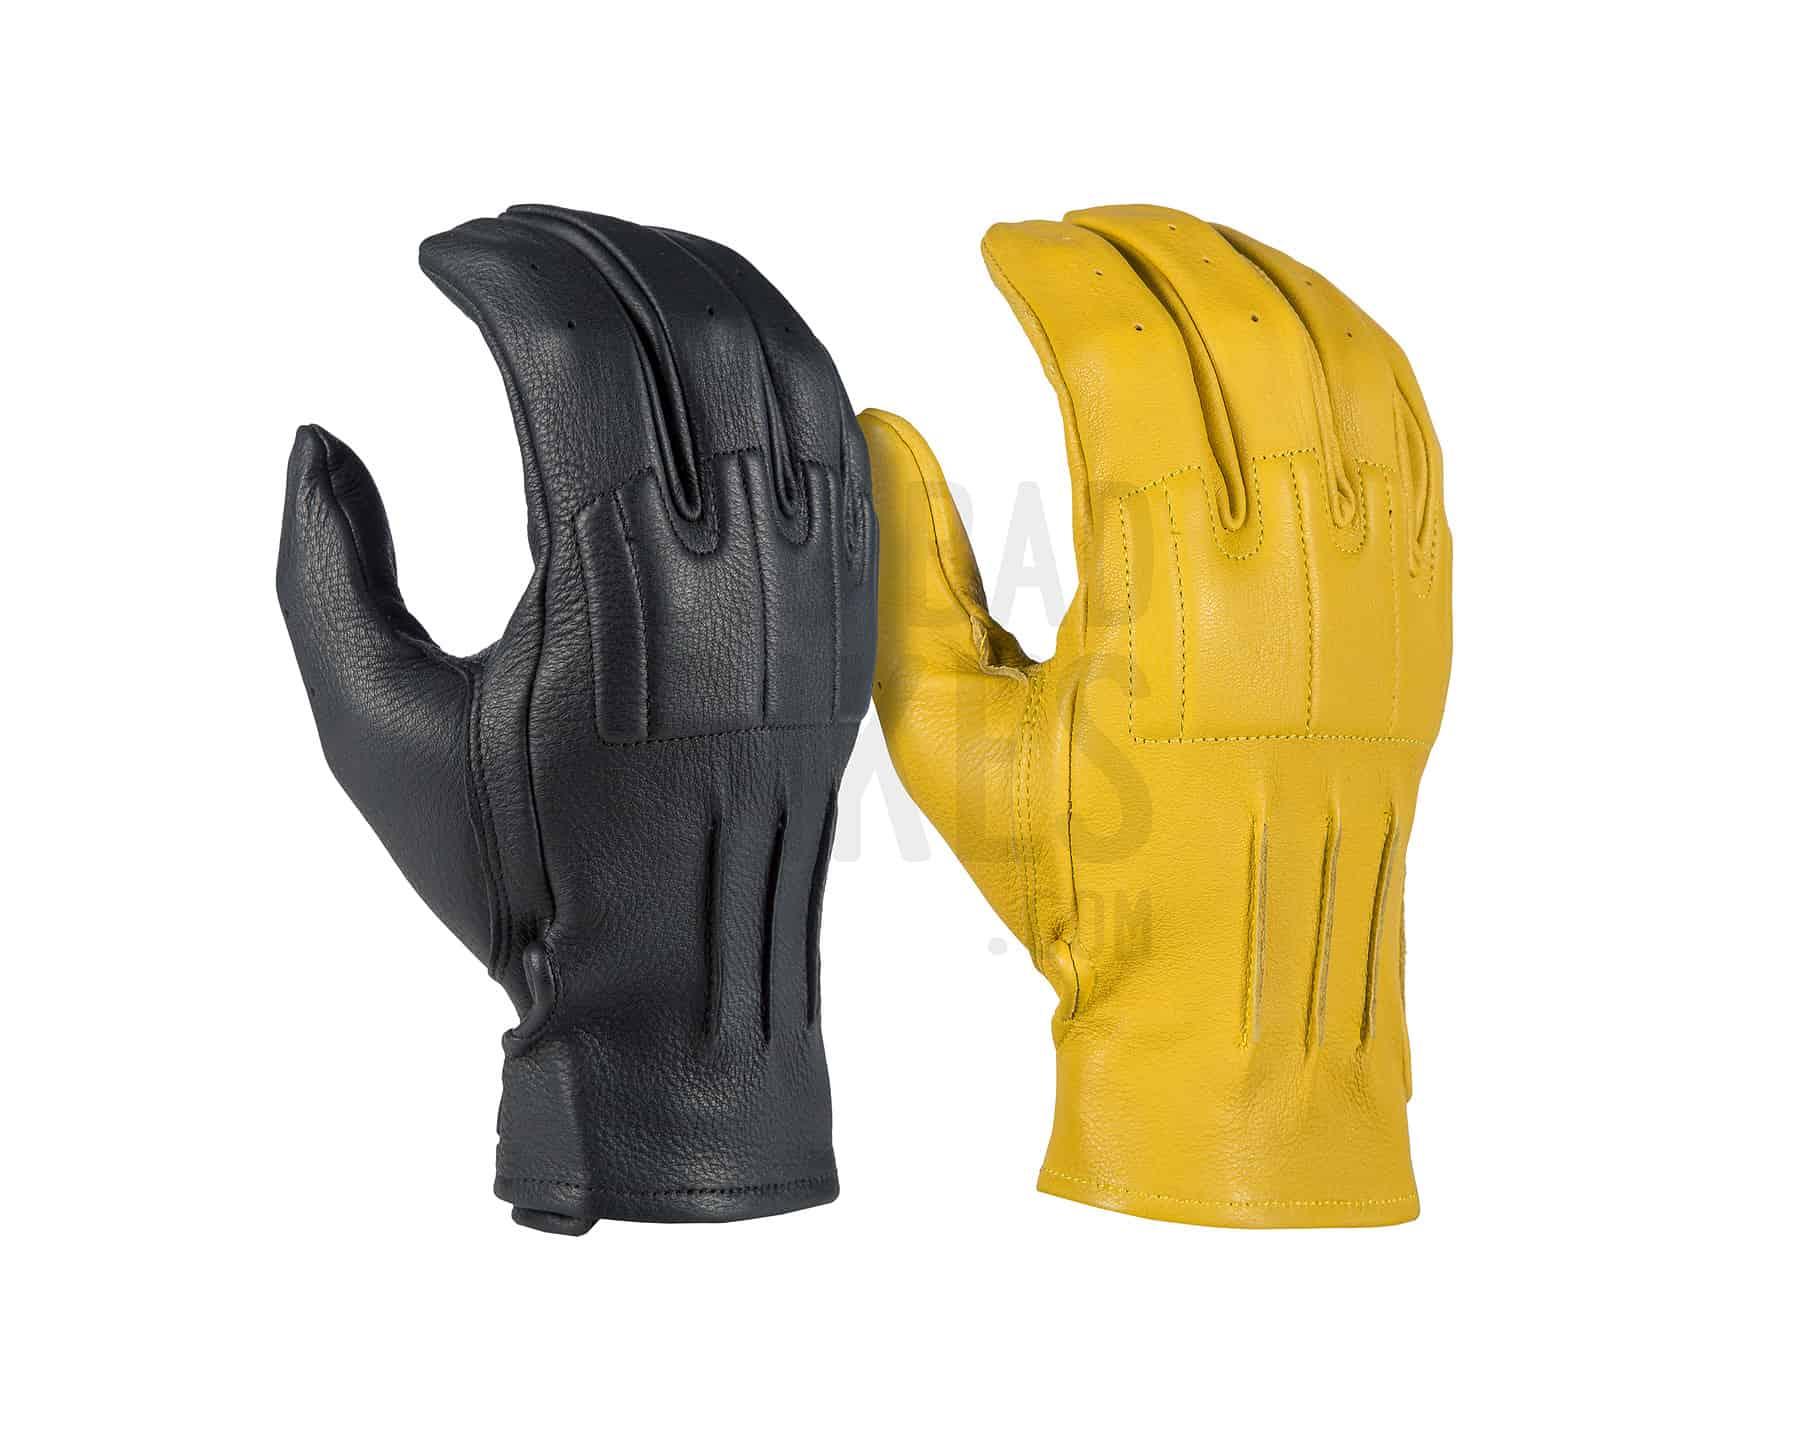 3895-000-900 Rambler Glove_Feature_01